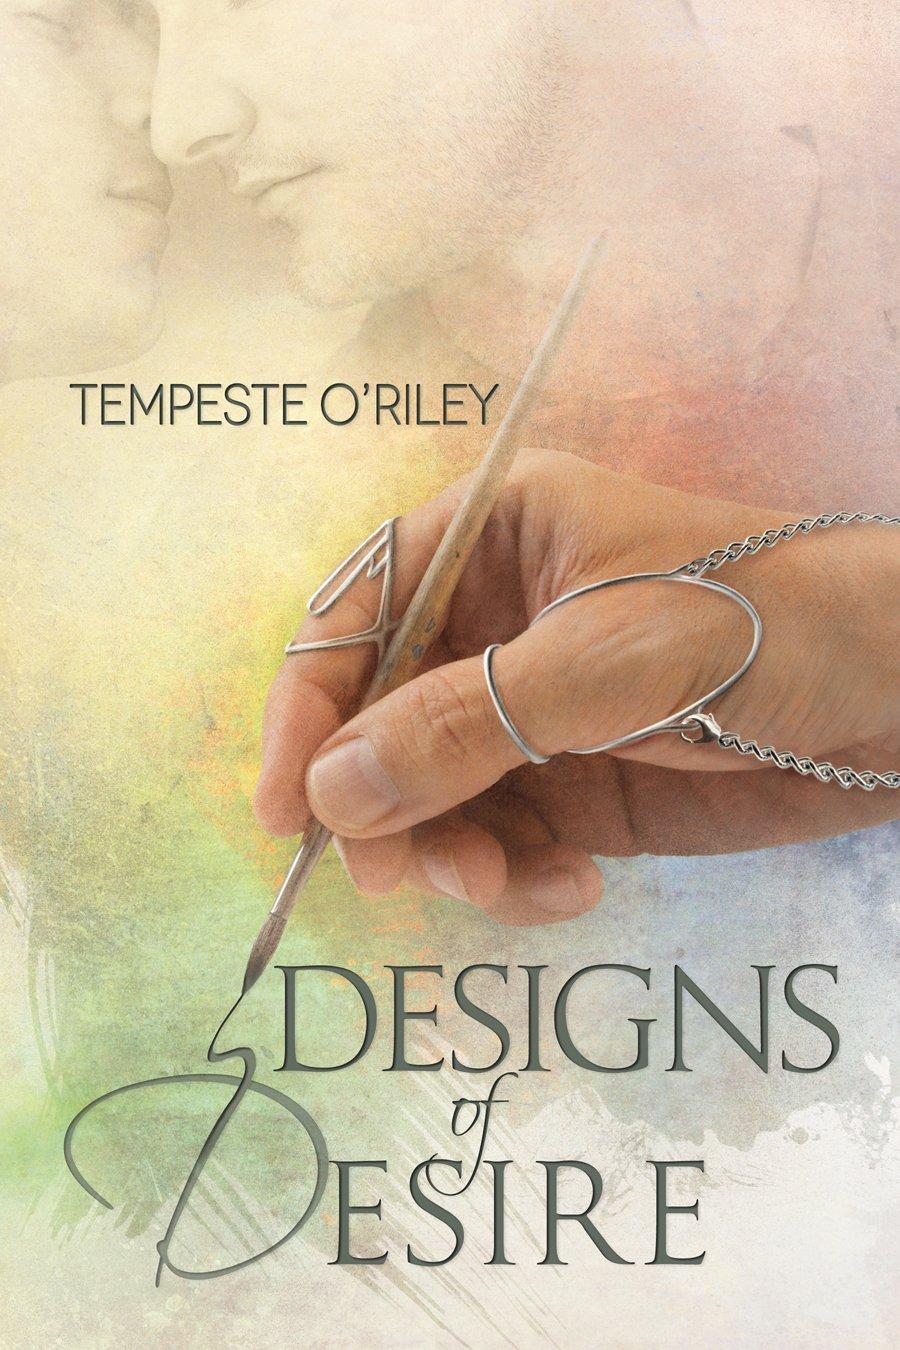 Designs-of-Desire-400x600